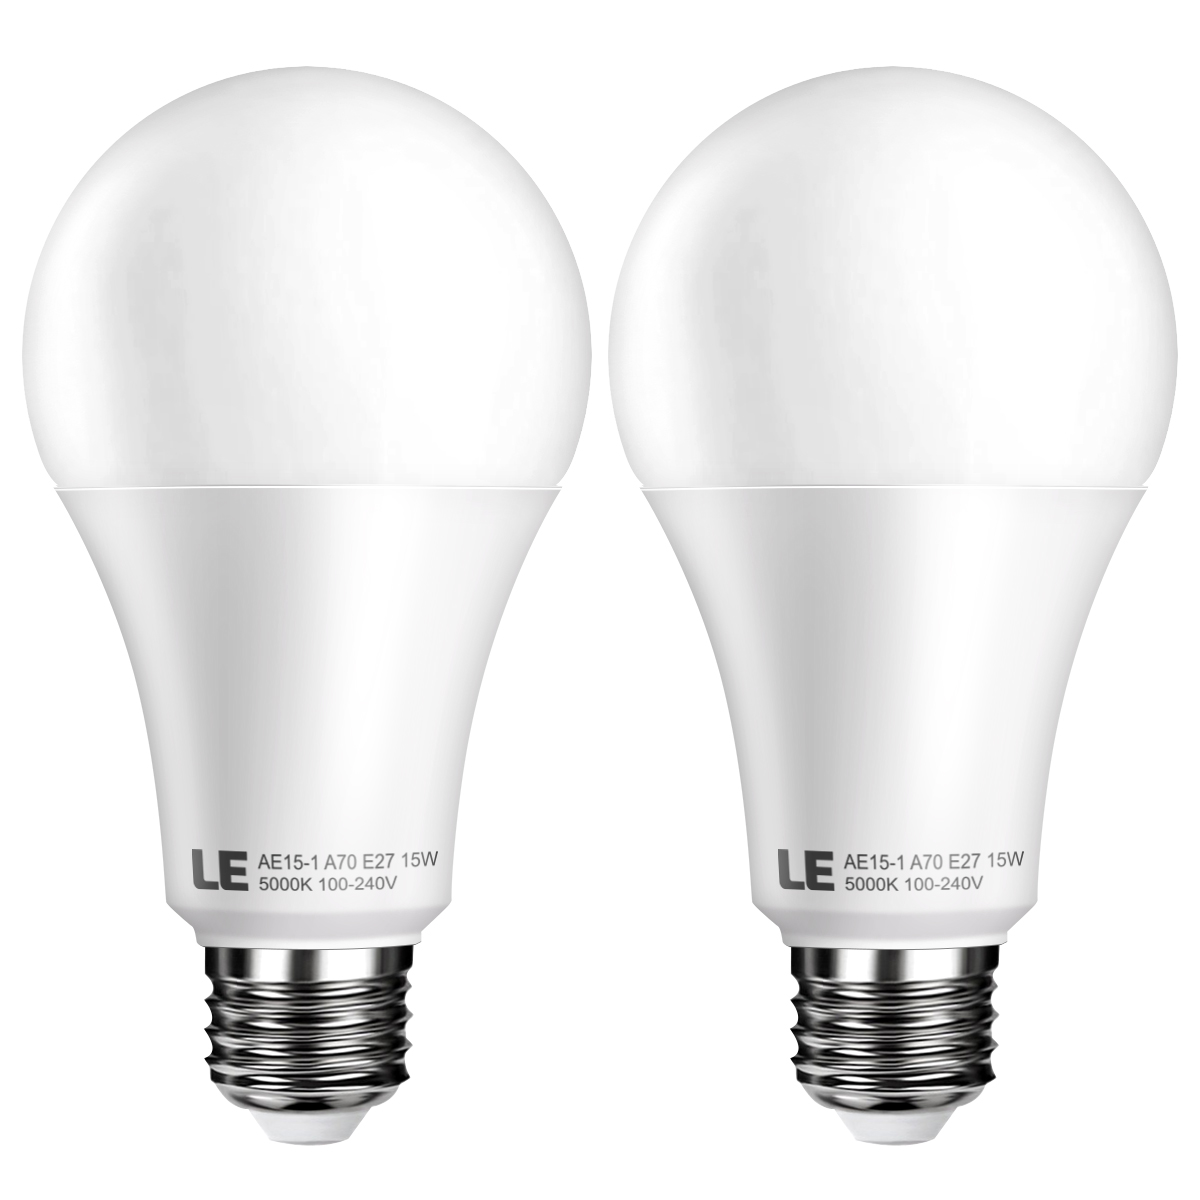 Superhelle 15W A70 E27 LED Lampen, Ersatz für 100W Glühbirne, 200° Abstrahlwinkel, 1500lm, Kaltwei? 5000K, LED Birnen, 2er Pack